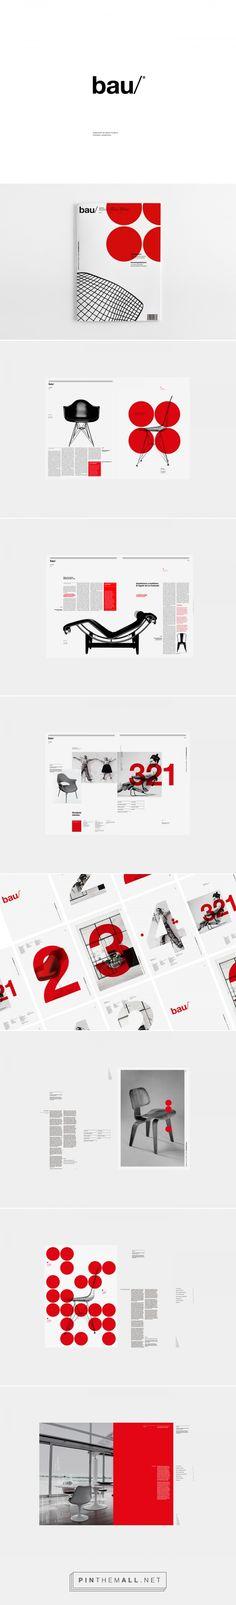 bau® Magazine on Behance - created via https://pinthemall.net